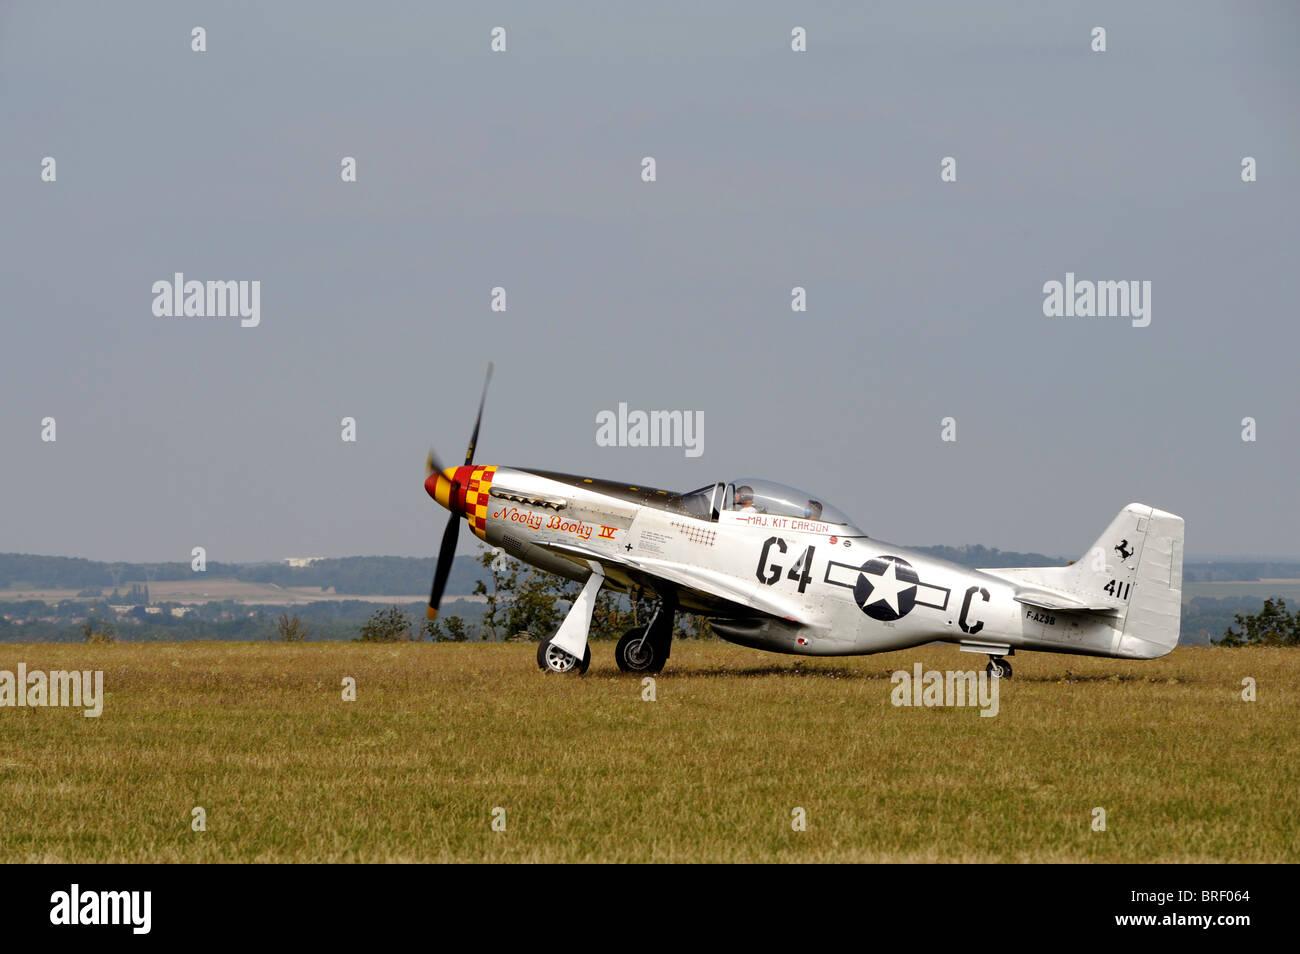 Nooky Booky IV,North American Aviation Mustang P-51D, Aerodrome de Cerny- La Ferte-Alais, Amicale Jean-Baptiste - Stock Image